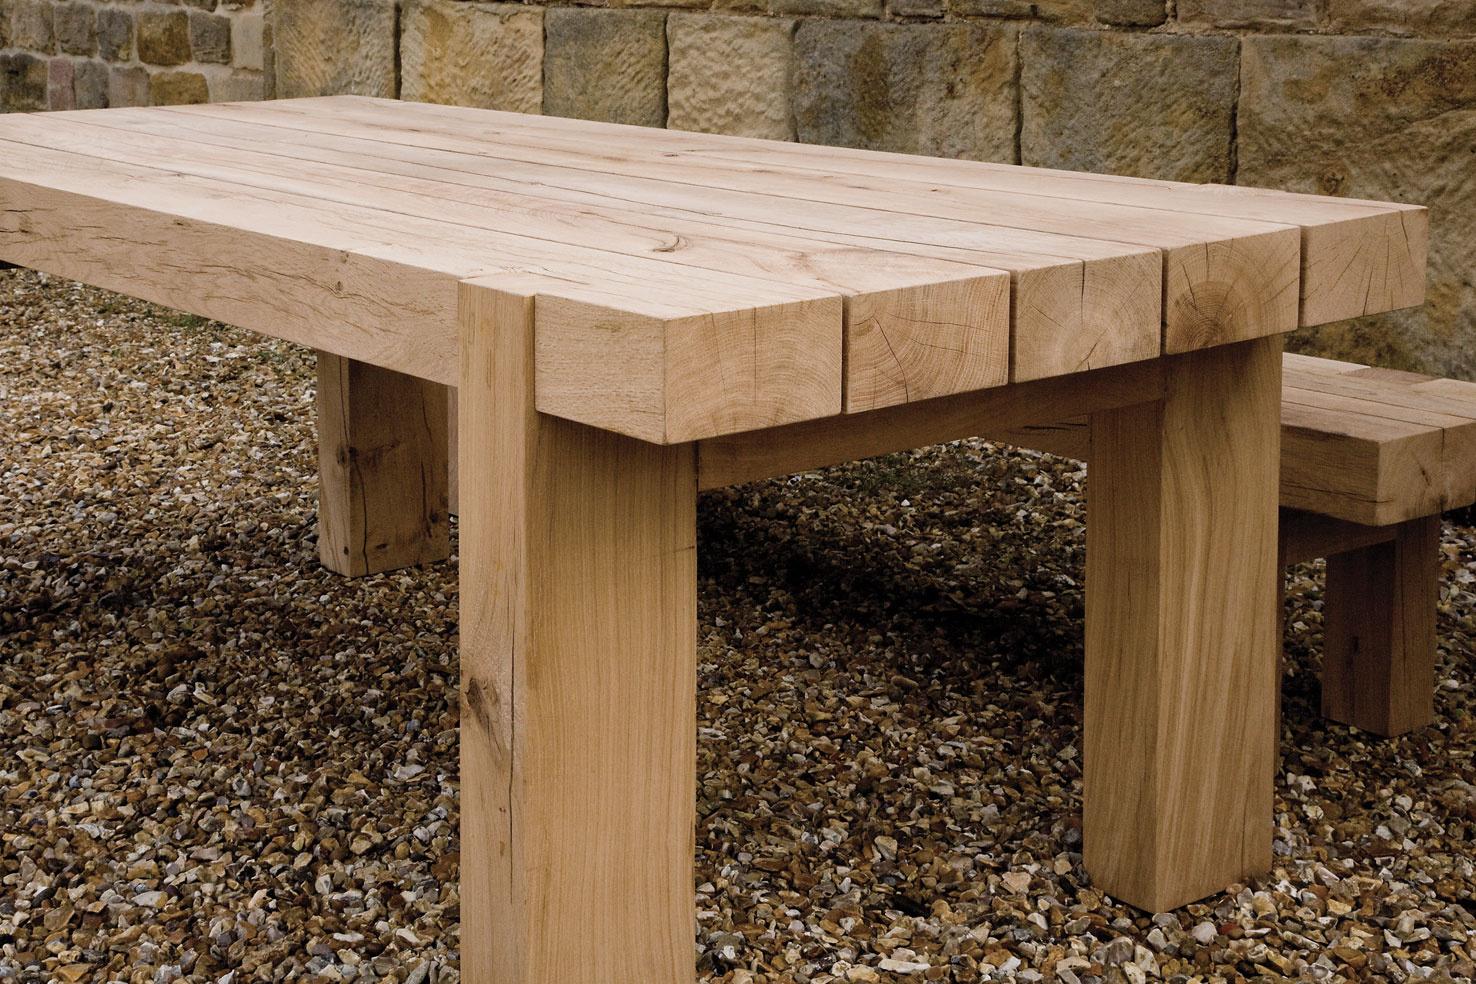 oak table share on facebook ... UOGZFTF